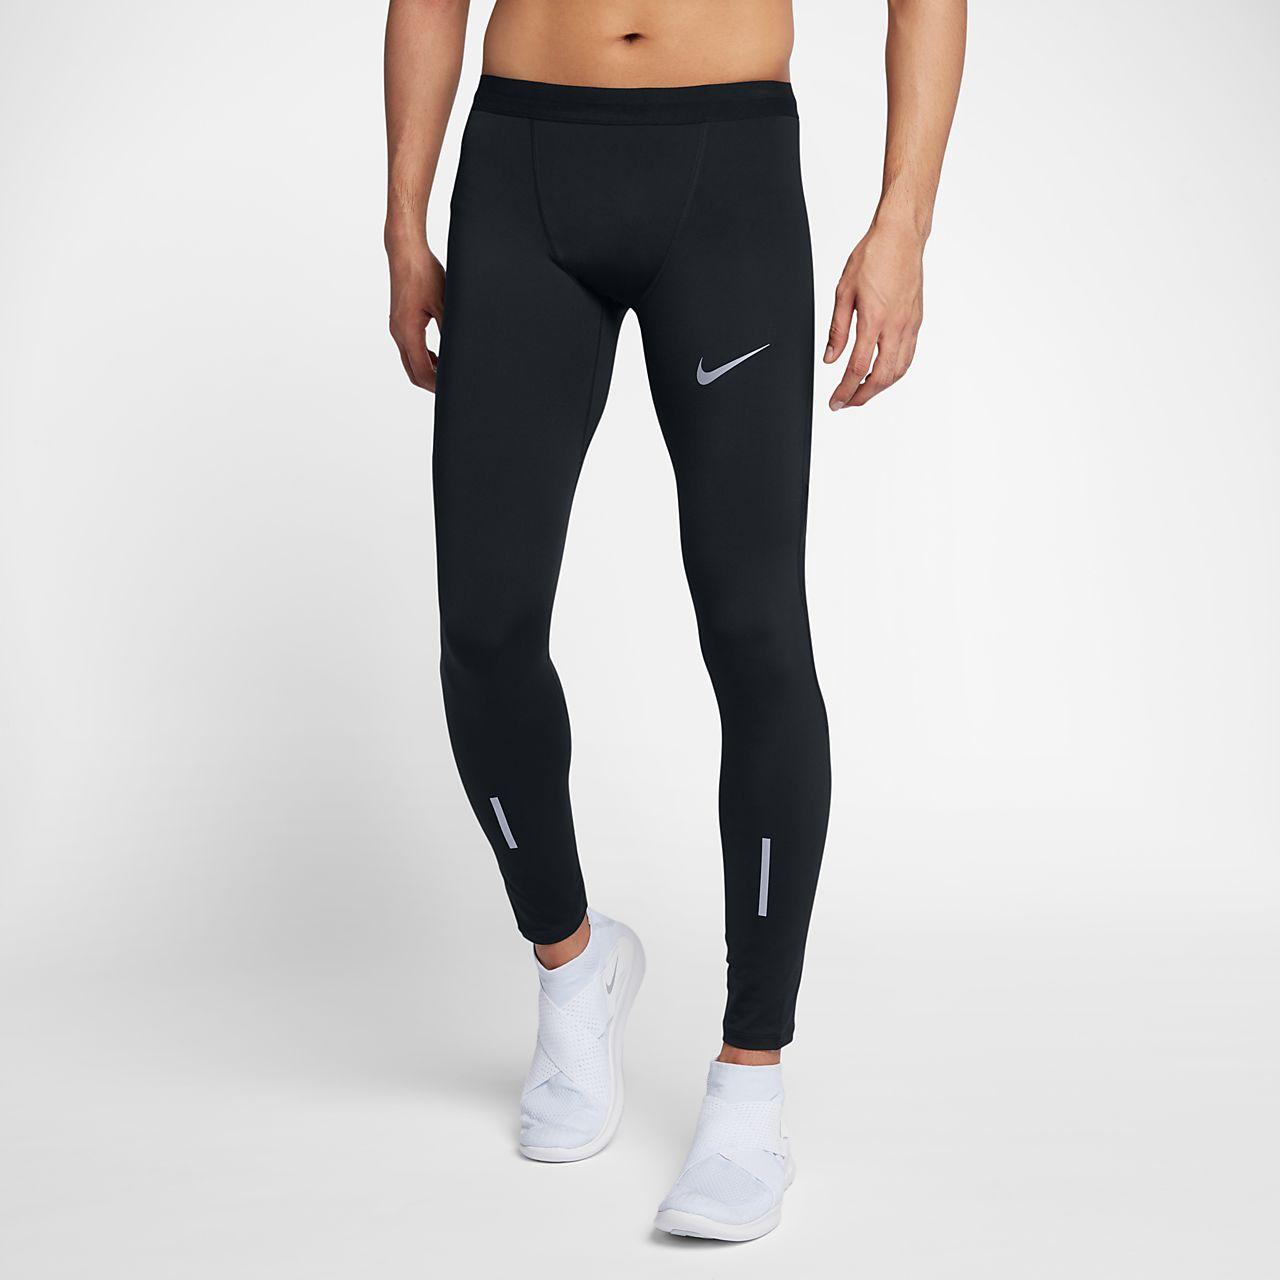 Mallas de running de 72 cm para hombre Nike Tech. Nike.com CL 70ea5564d3de1